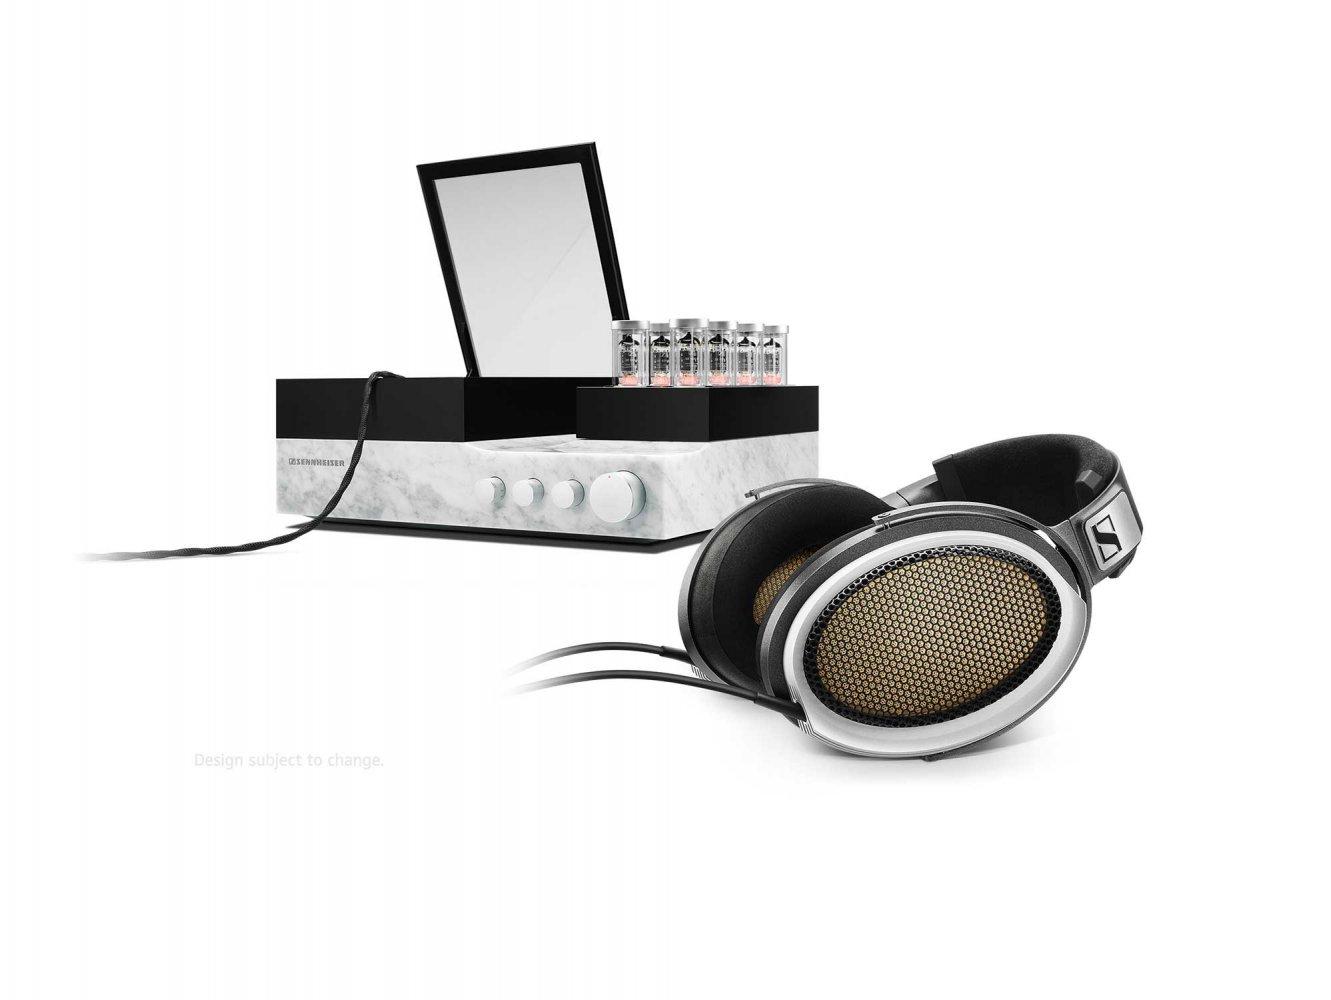 Sennheiser Orpheus headphones and bass unit.